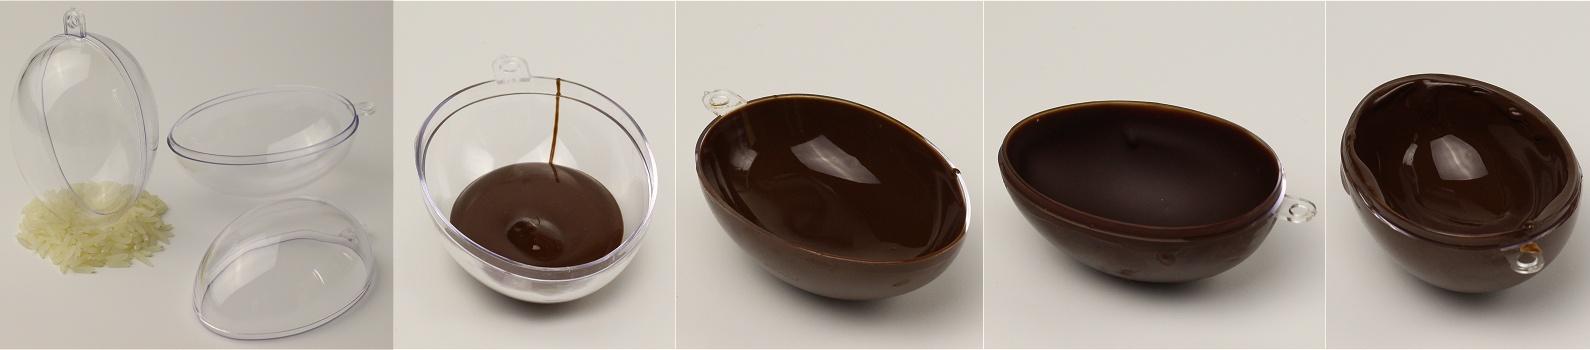 Anleitung Selbstgemachte Schokoladeneier 2